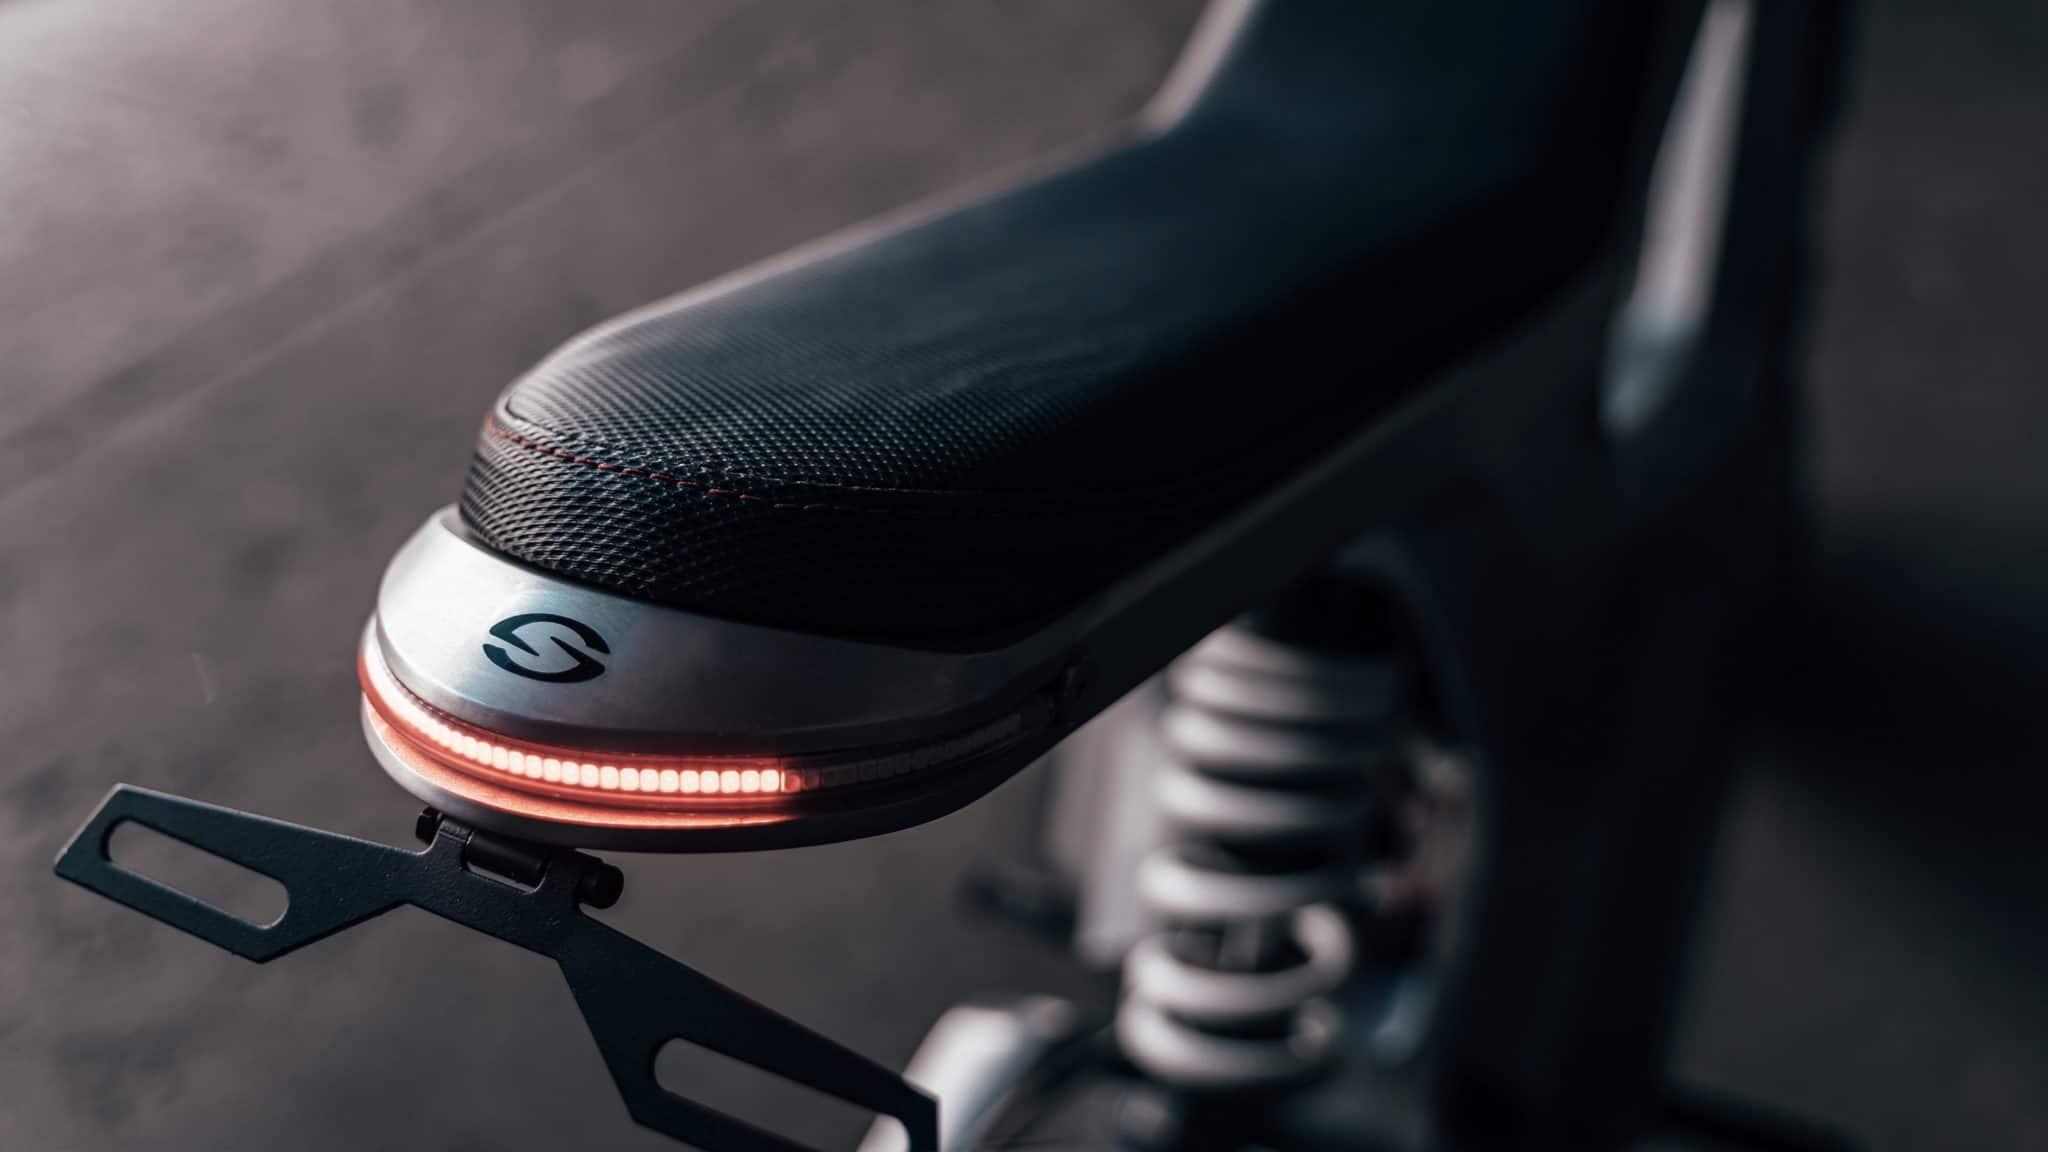 Sondors Metacycle Seat and Brake Light